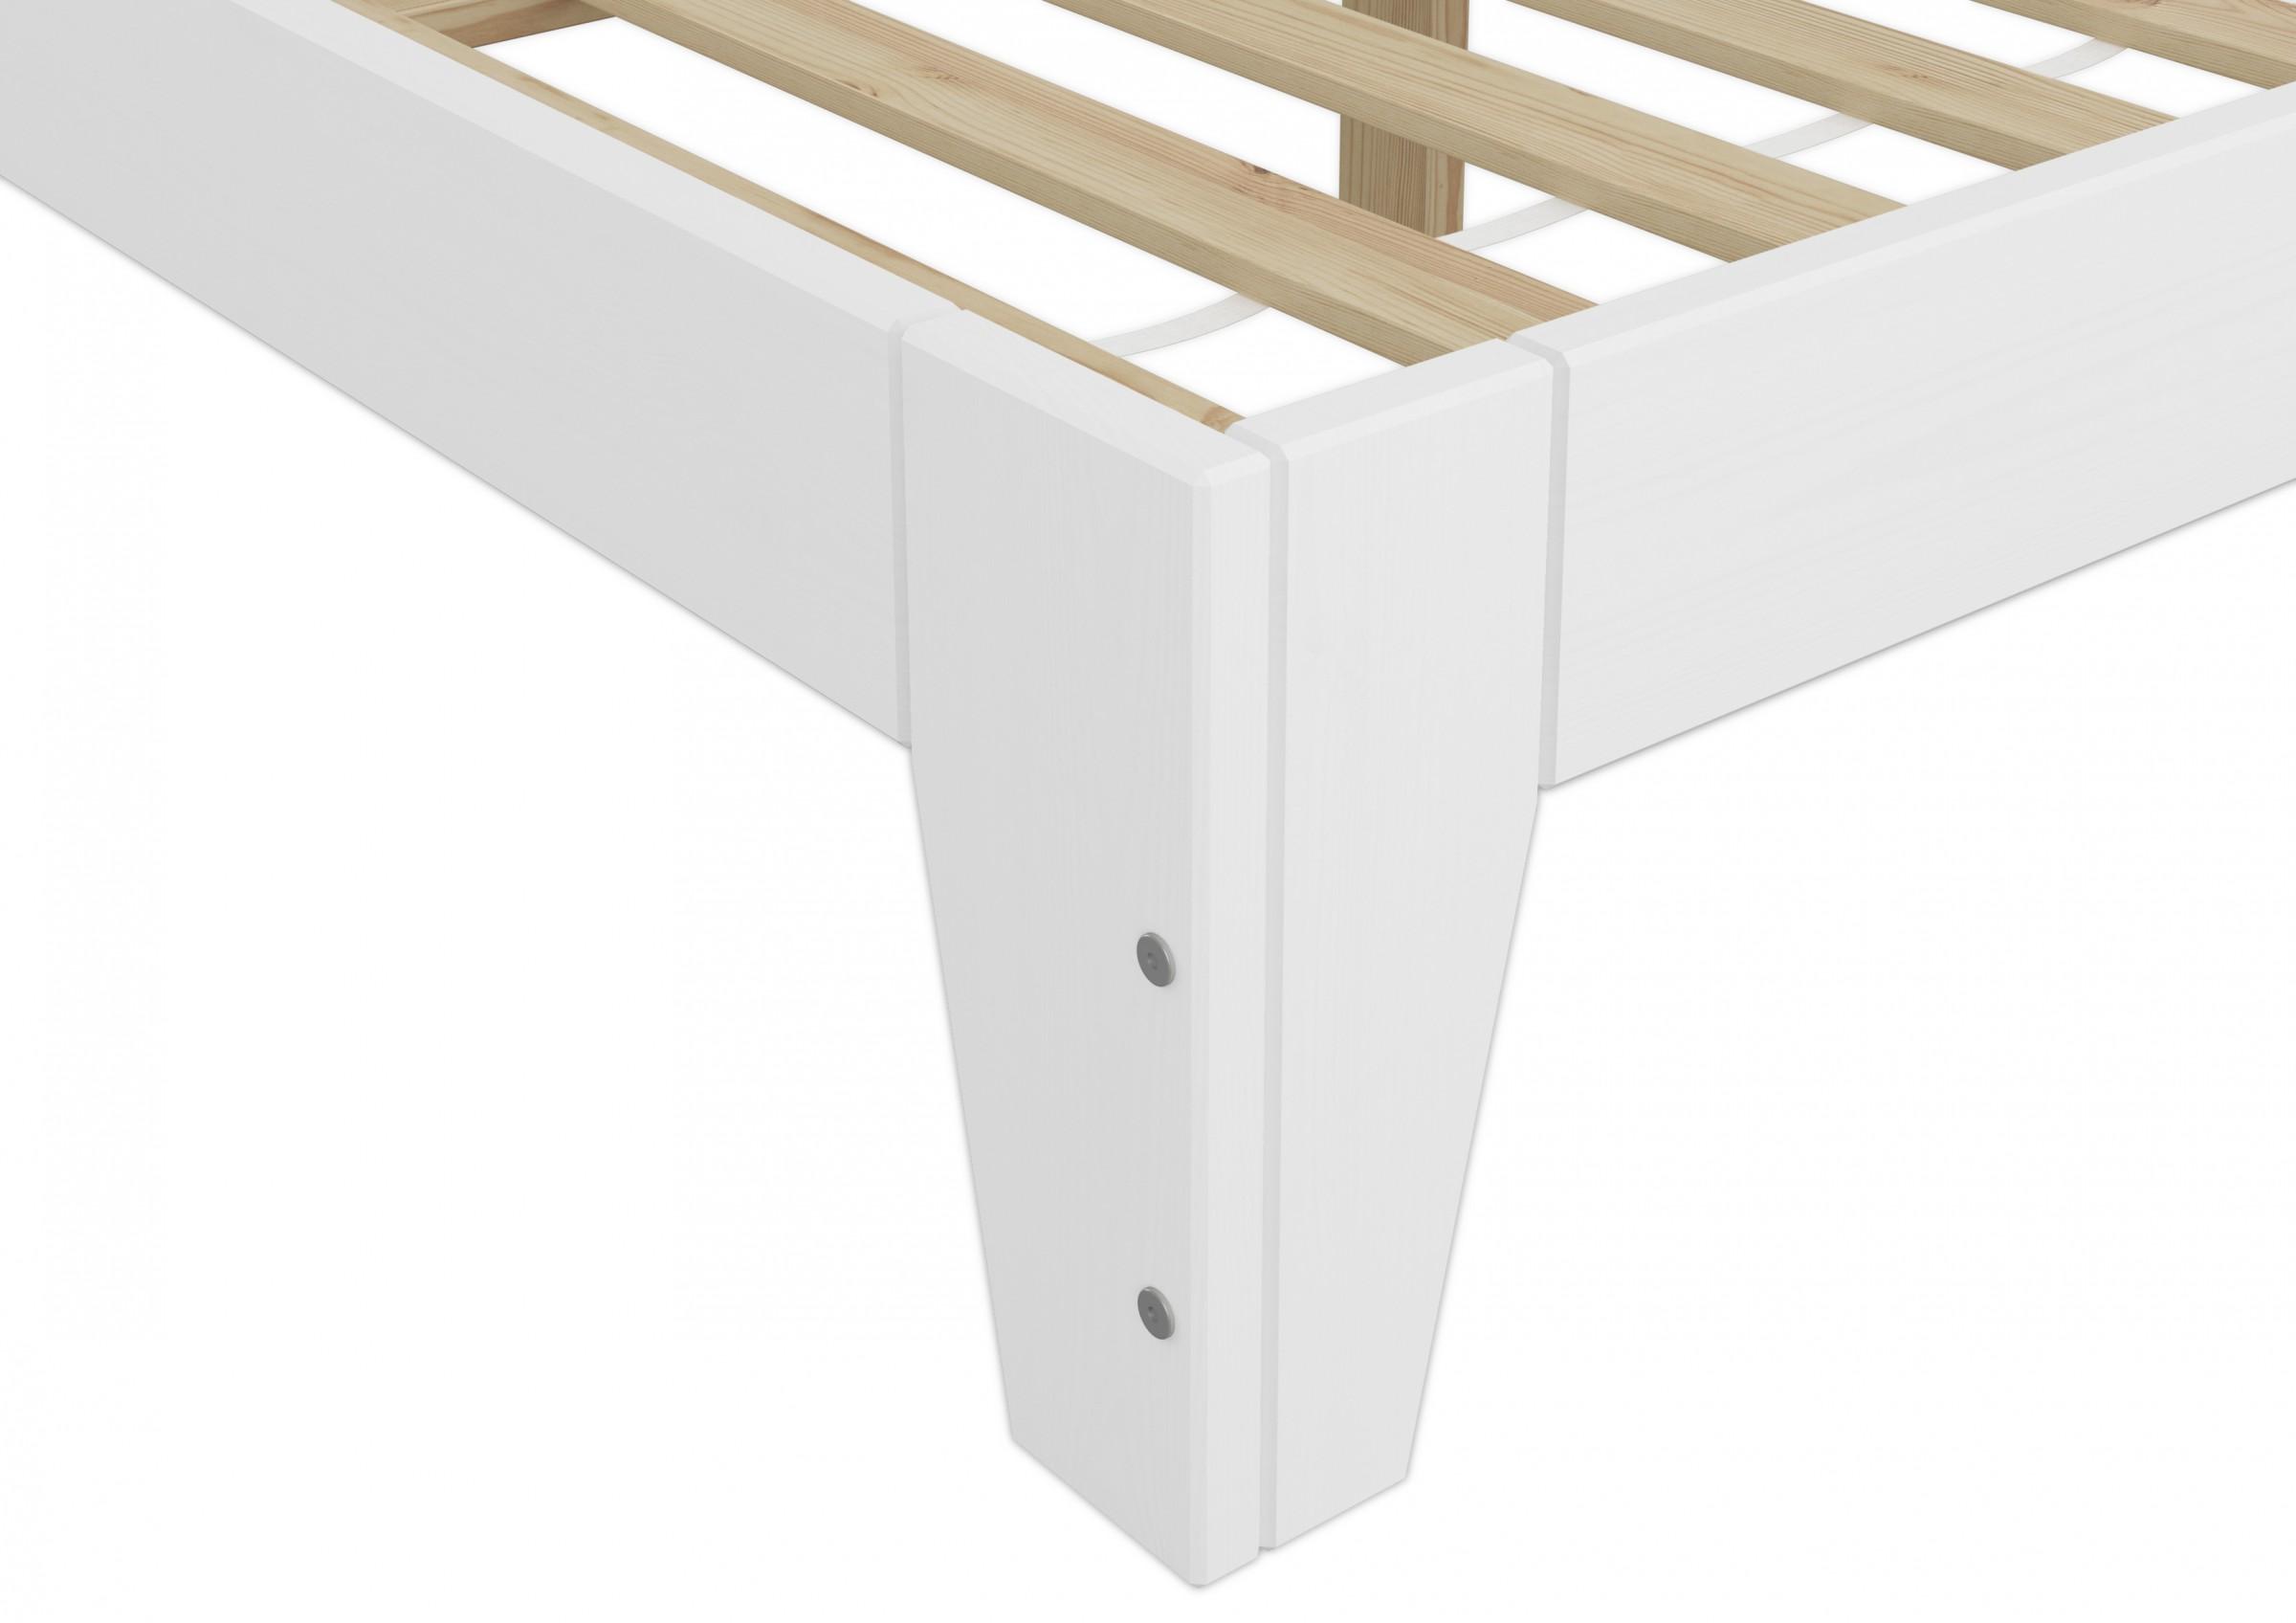 futonbett 120x200 massivholz kiefer bettgestell einzelbett wei w or ebay. Black Bedroom Furniture Sets. Home Design Ideas